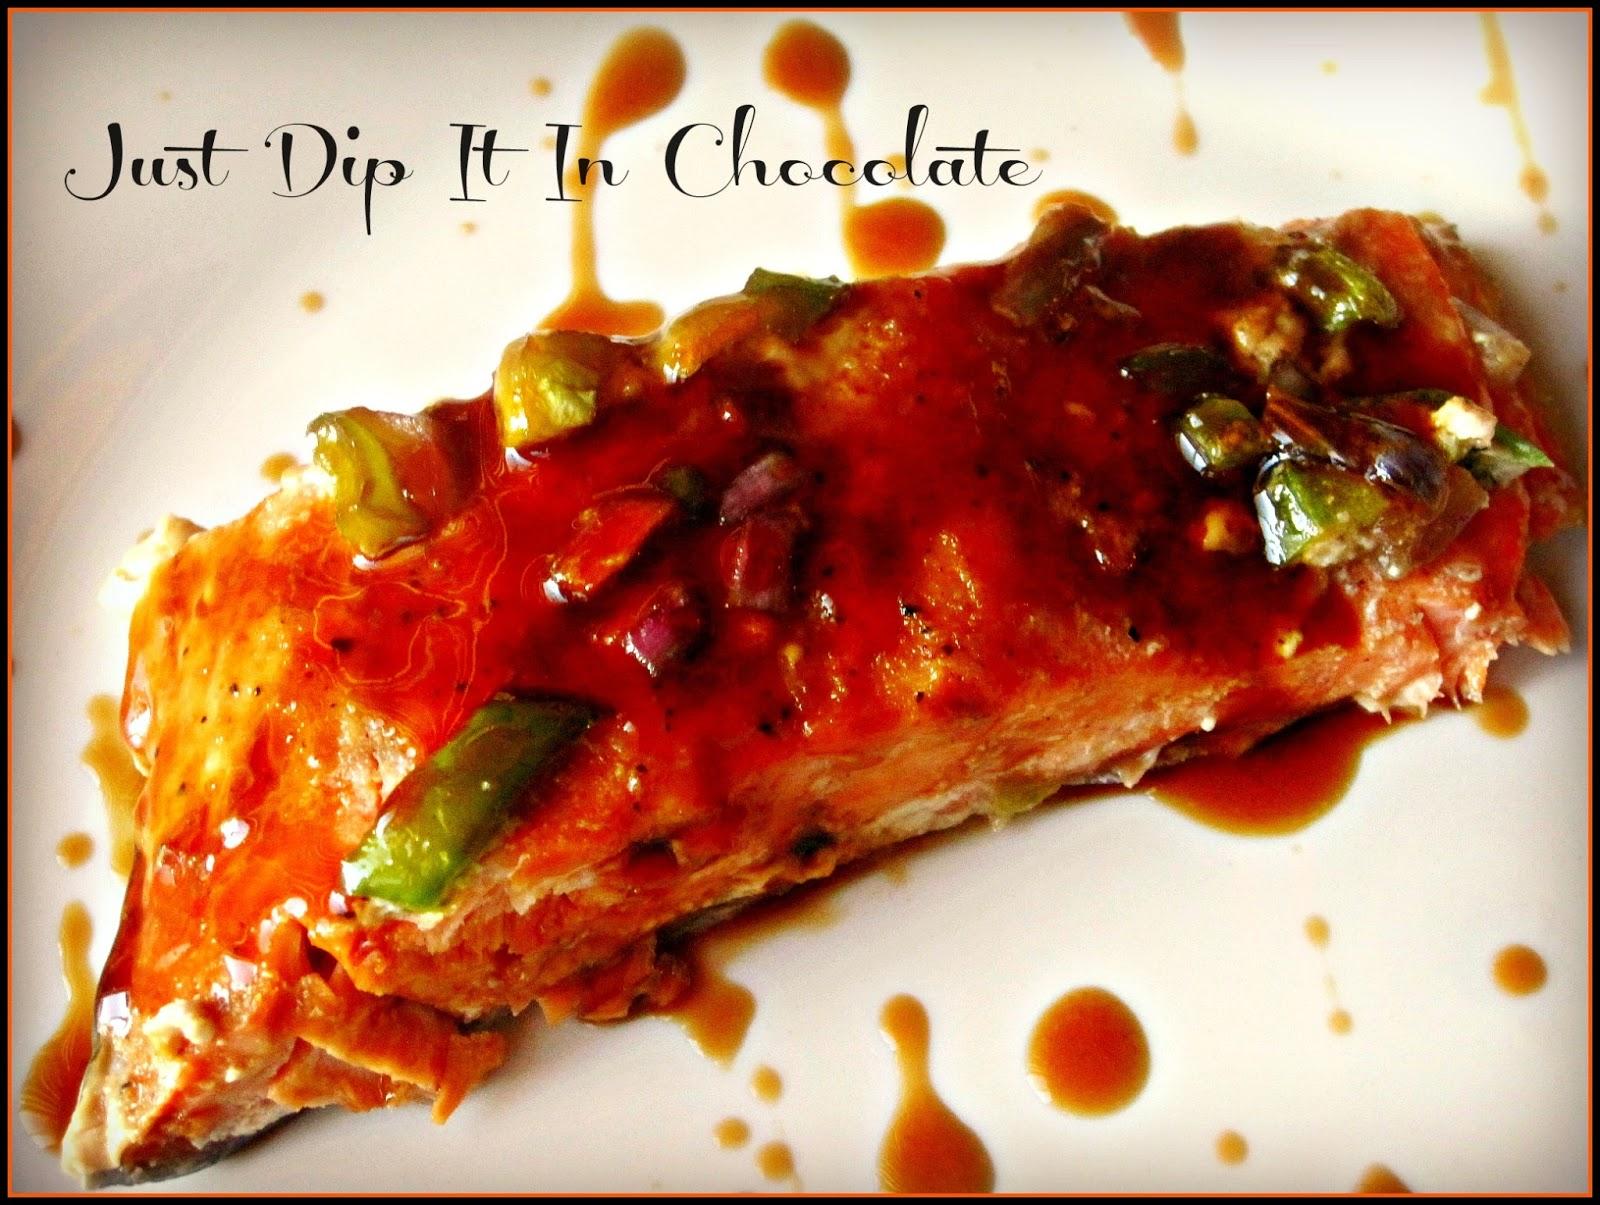 Just Dip It In Chocolate Salmon Al Cartoccio Recipe